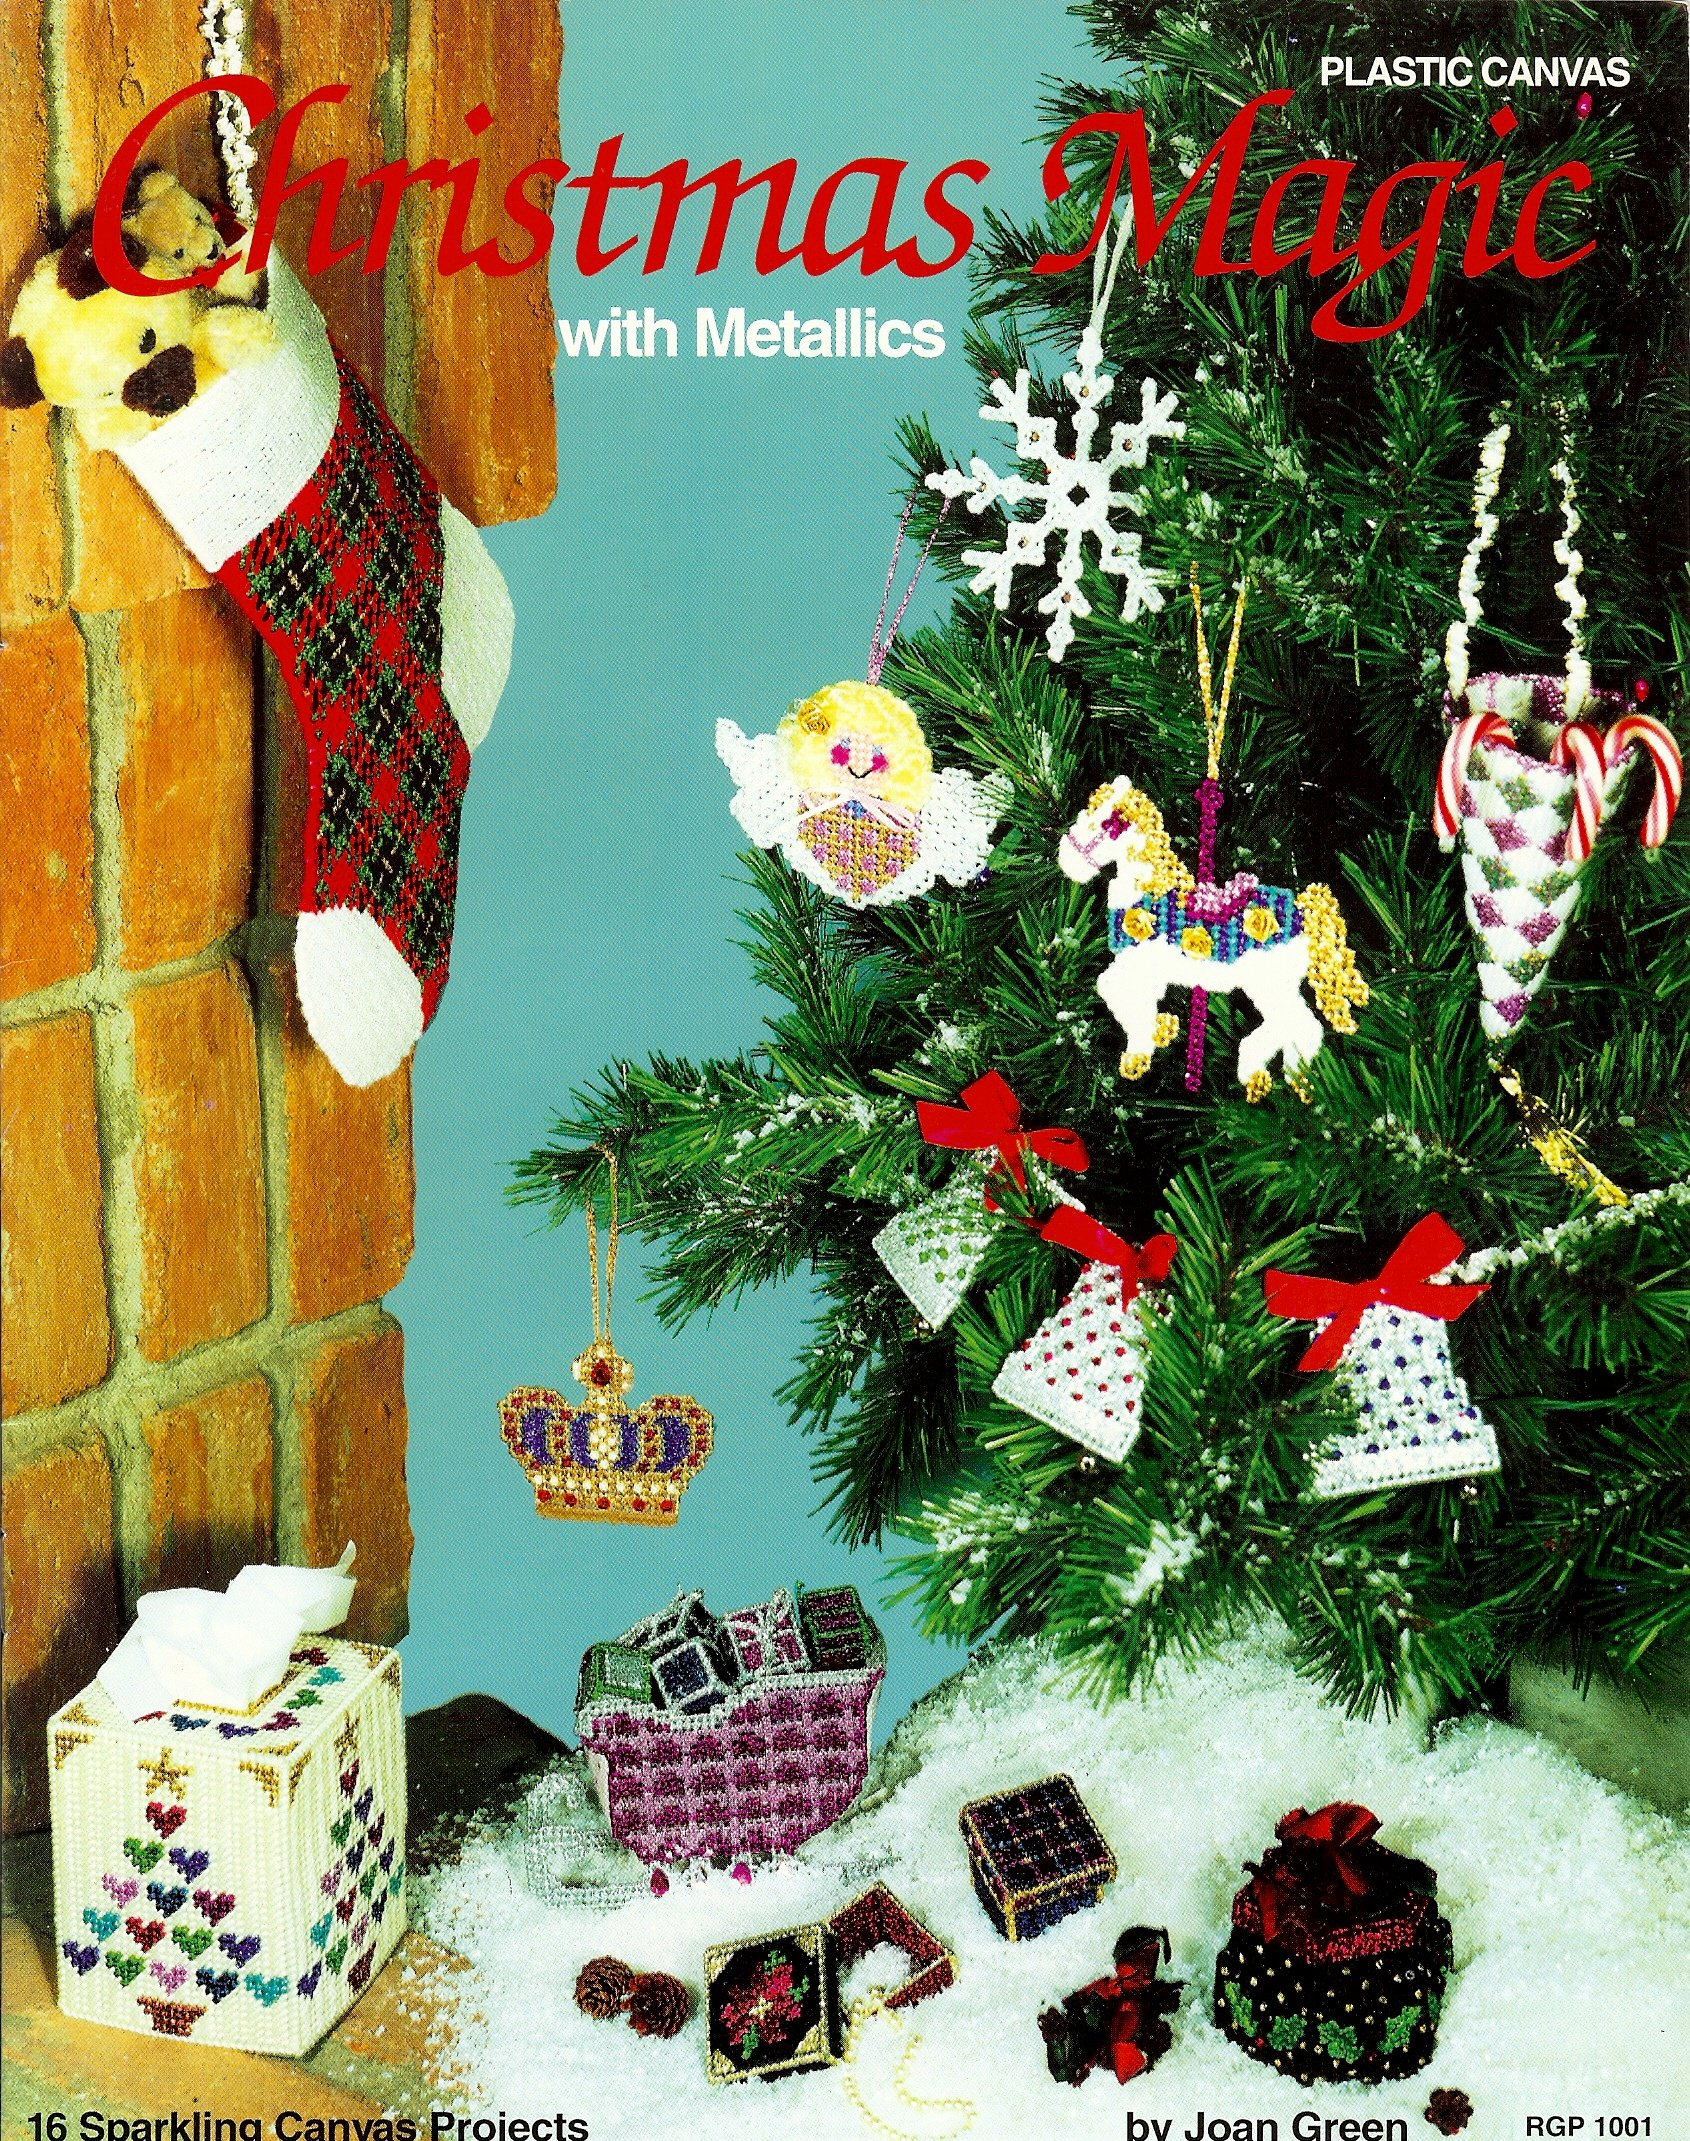 Plastic Canvas Christmas Ornaments.Plastic Canvas Christmas Magic With Metallics 16 Sparkling